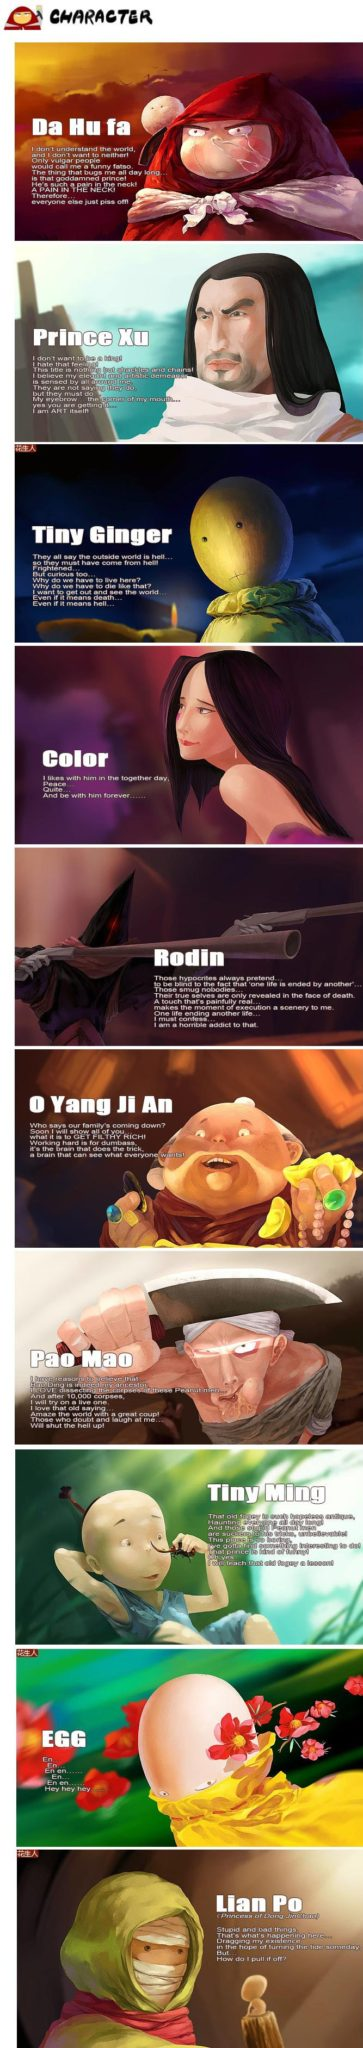 The Black Peanut Chinese animation